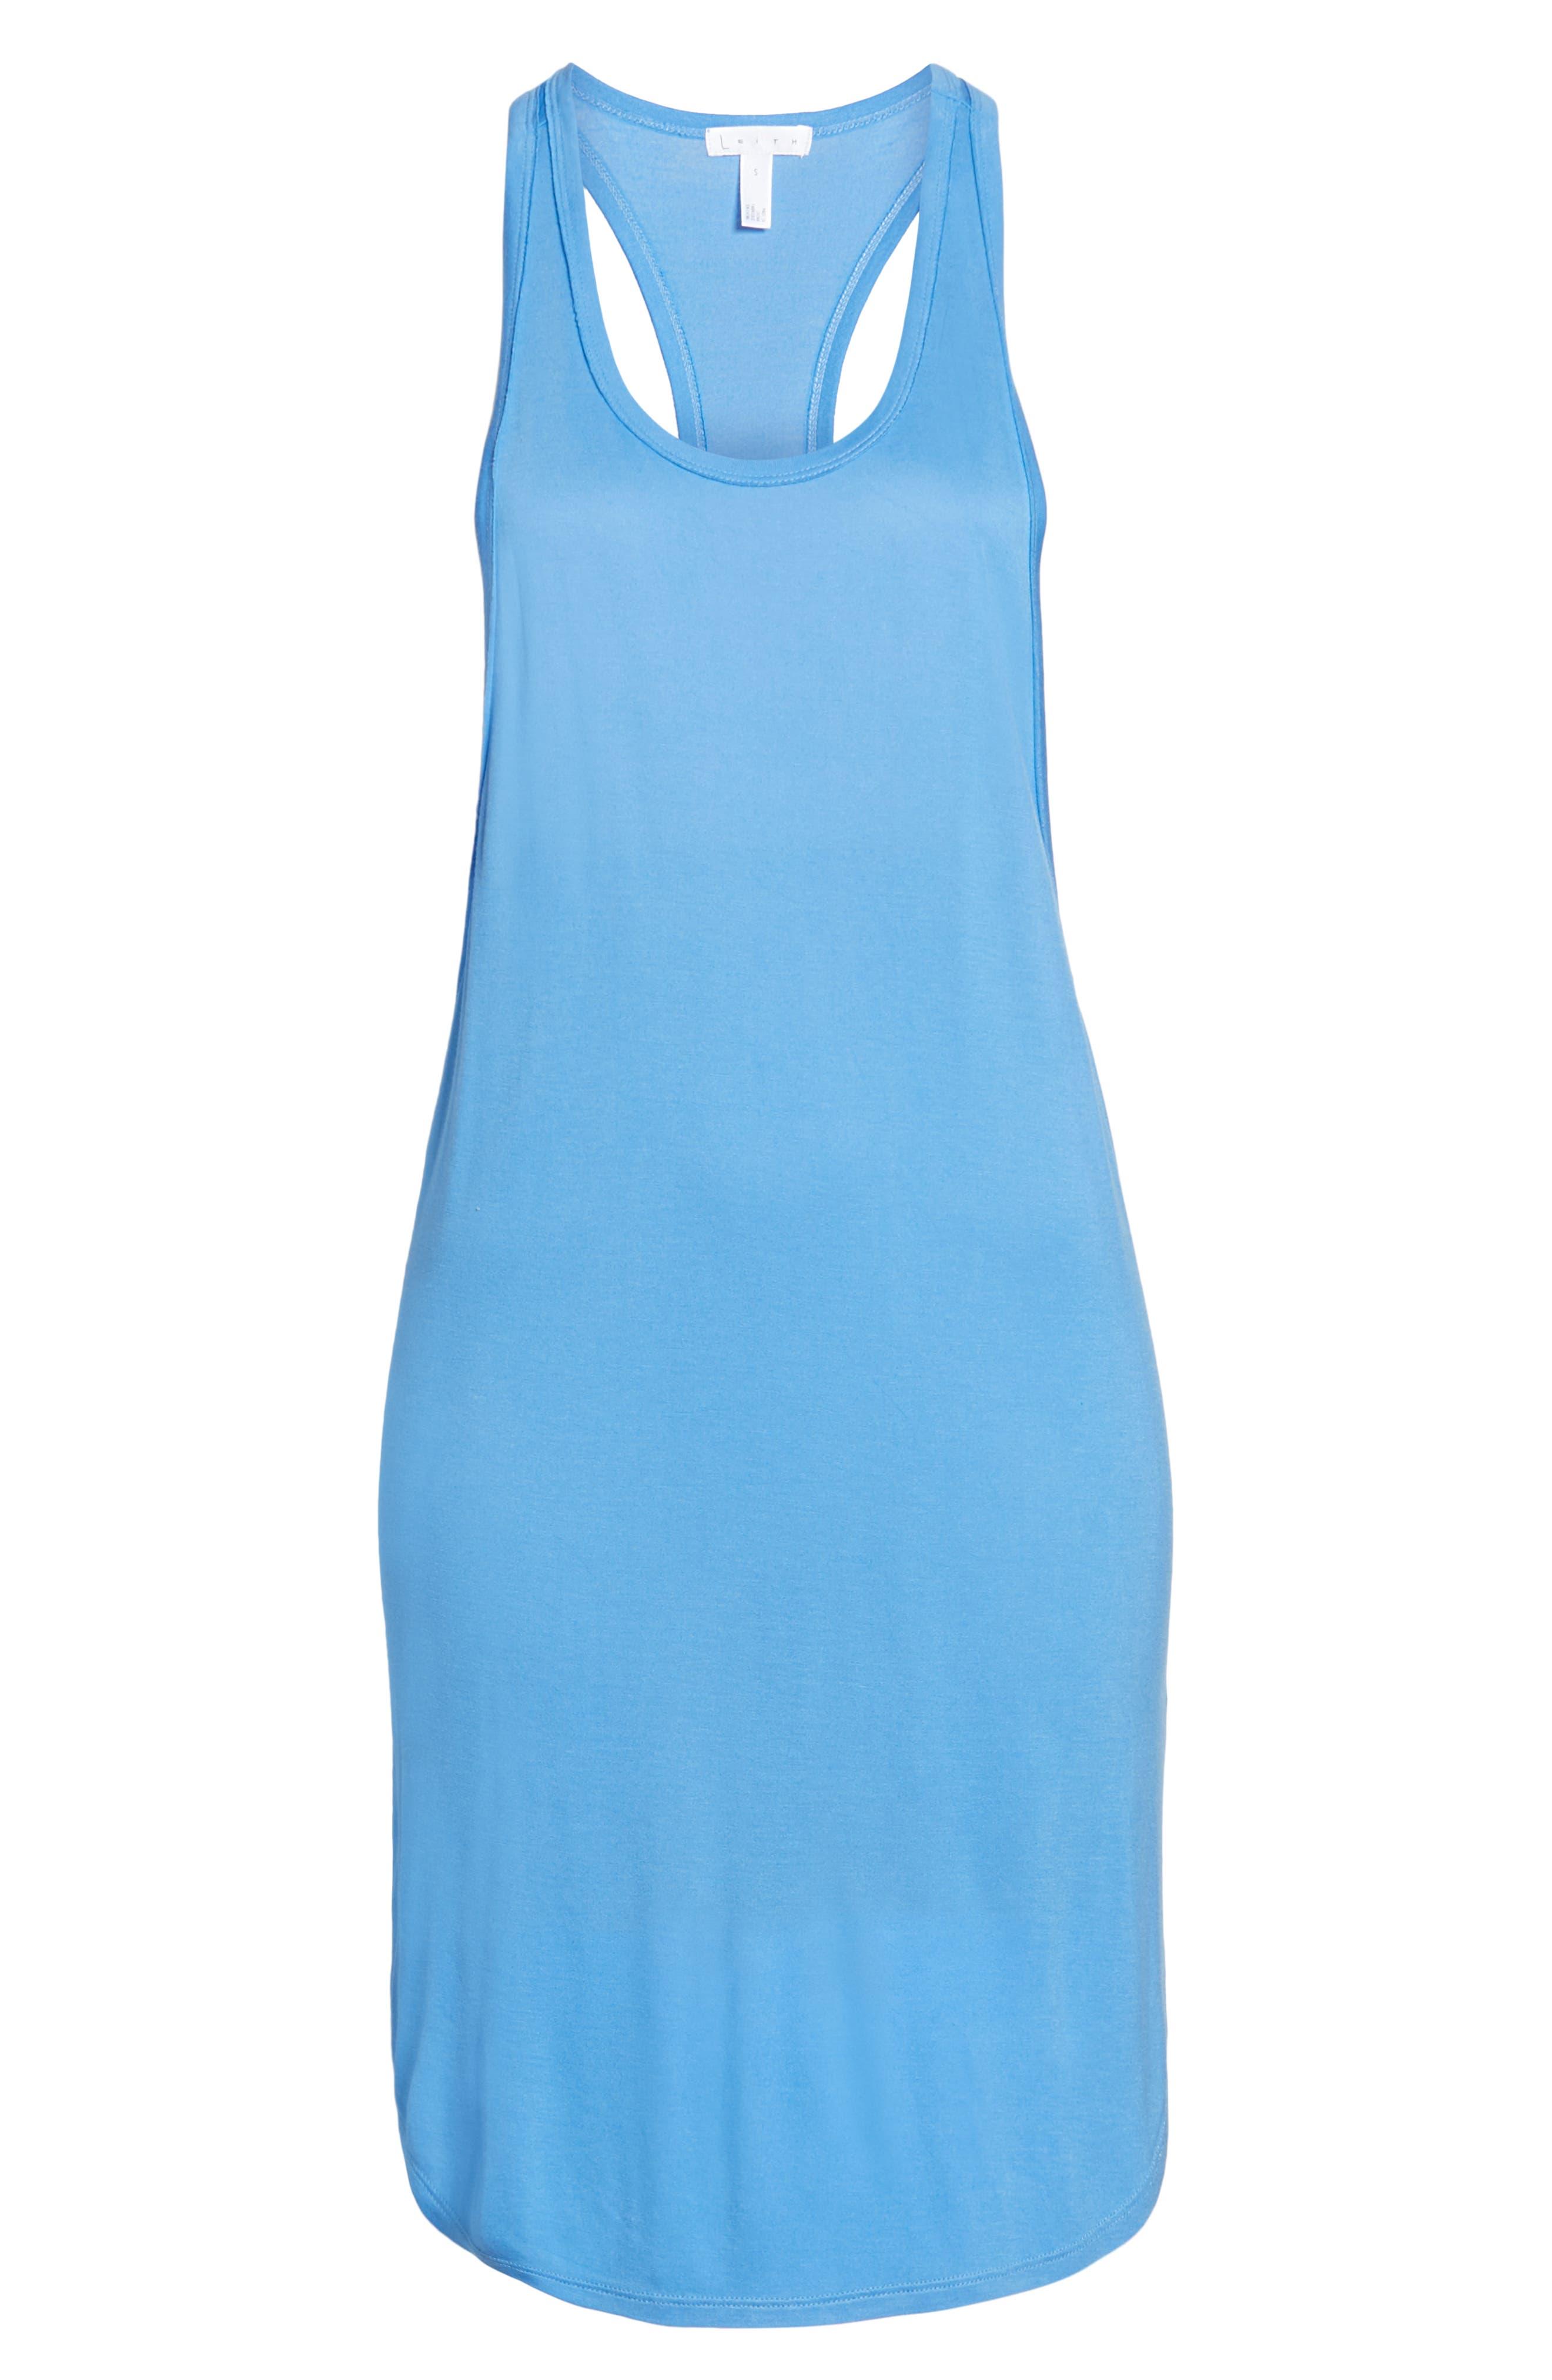 Racerback Cover-Up Tank Dress,                             Alternate thumbnail 6, color,                             BLUE LAPIS